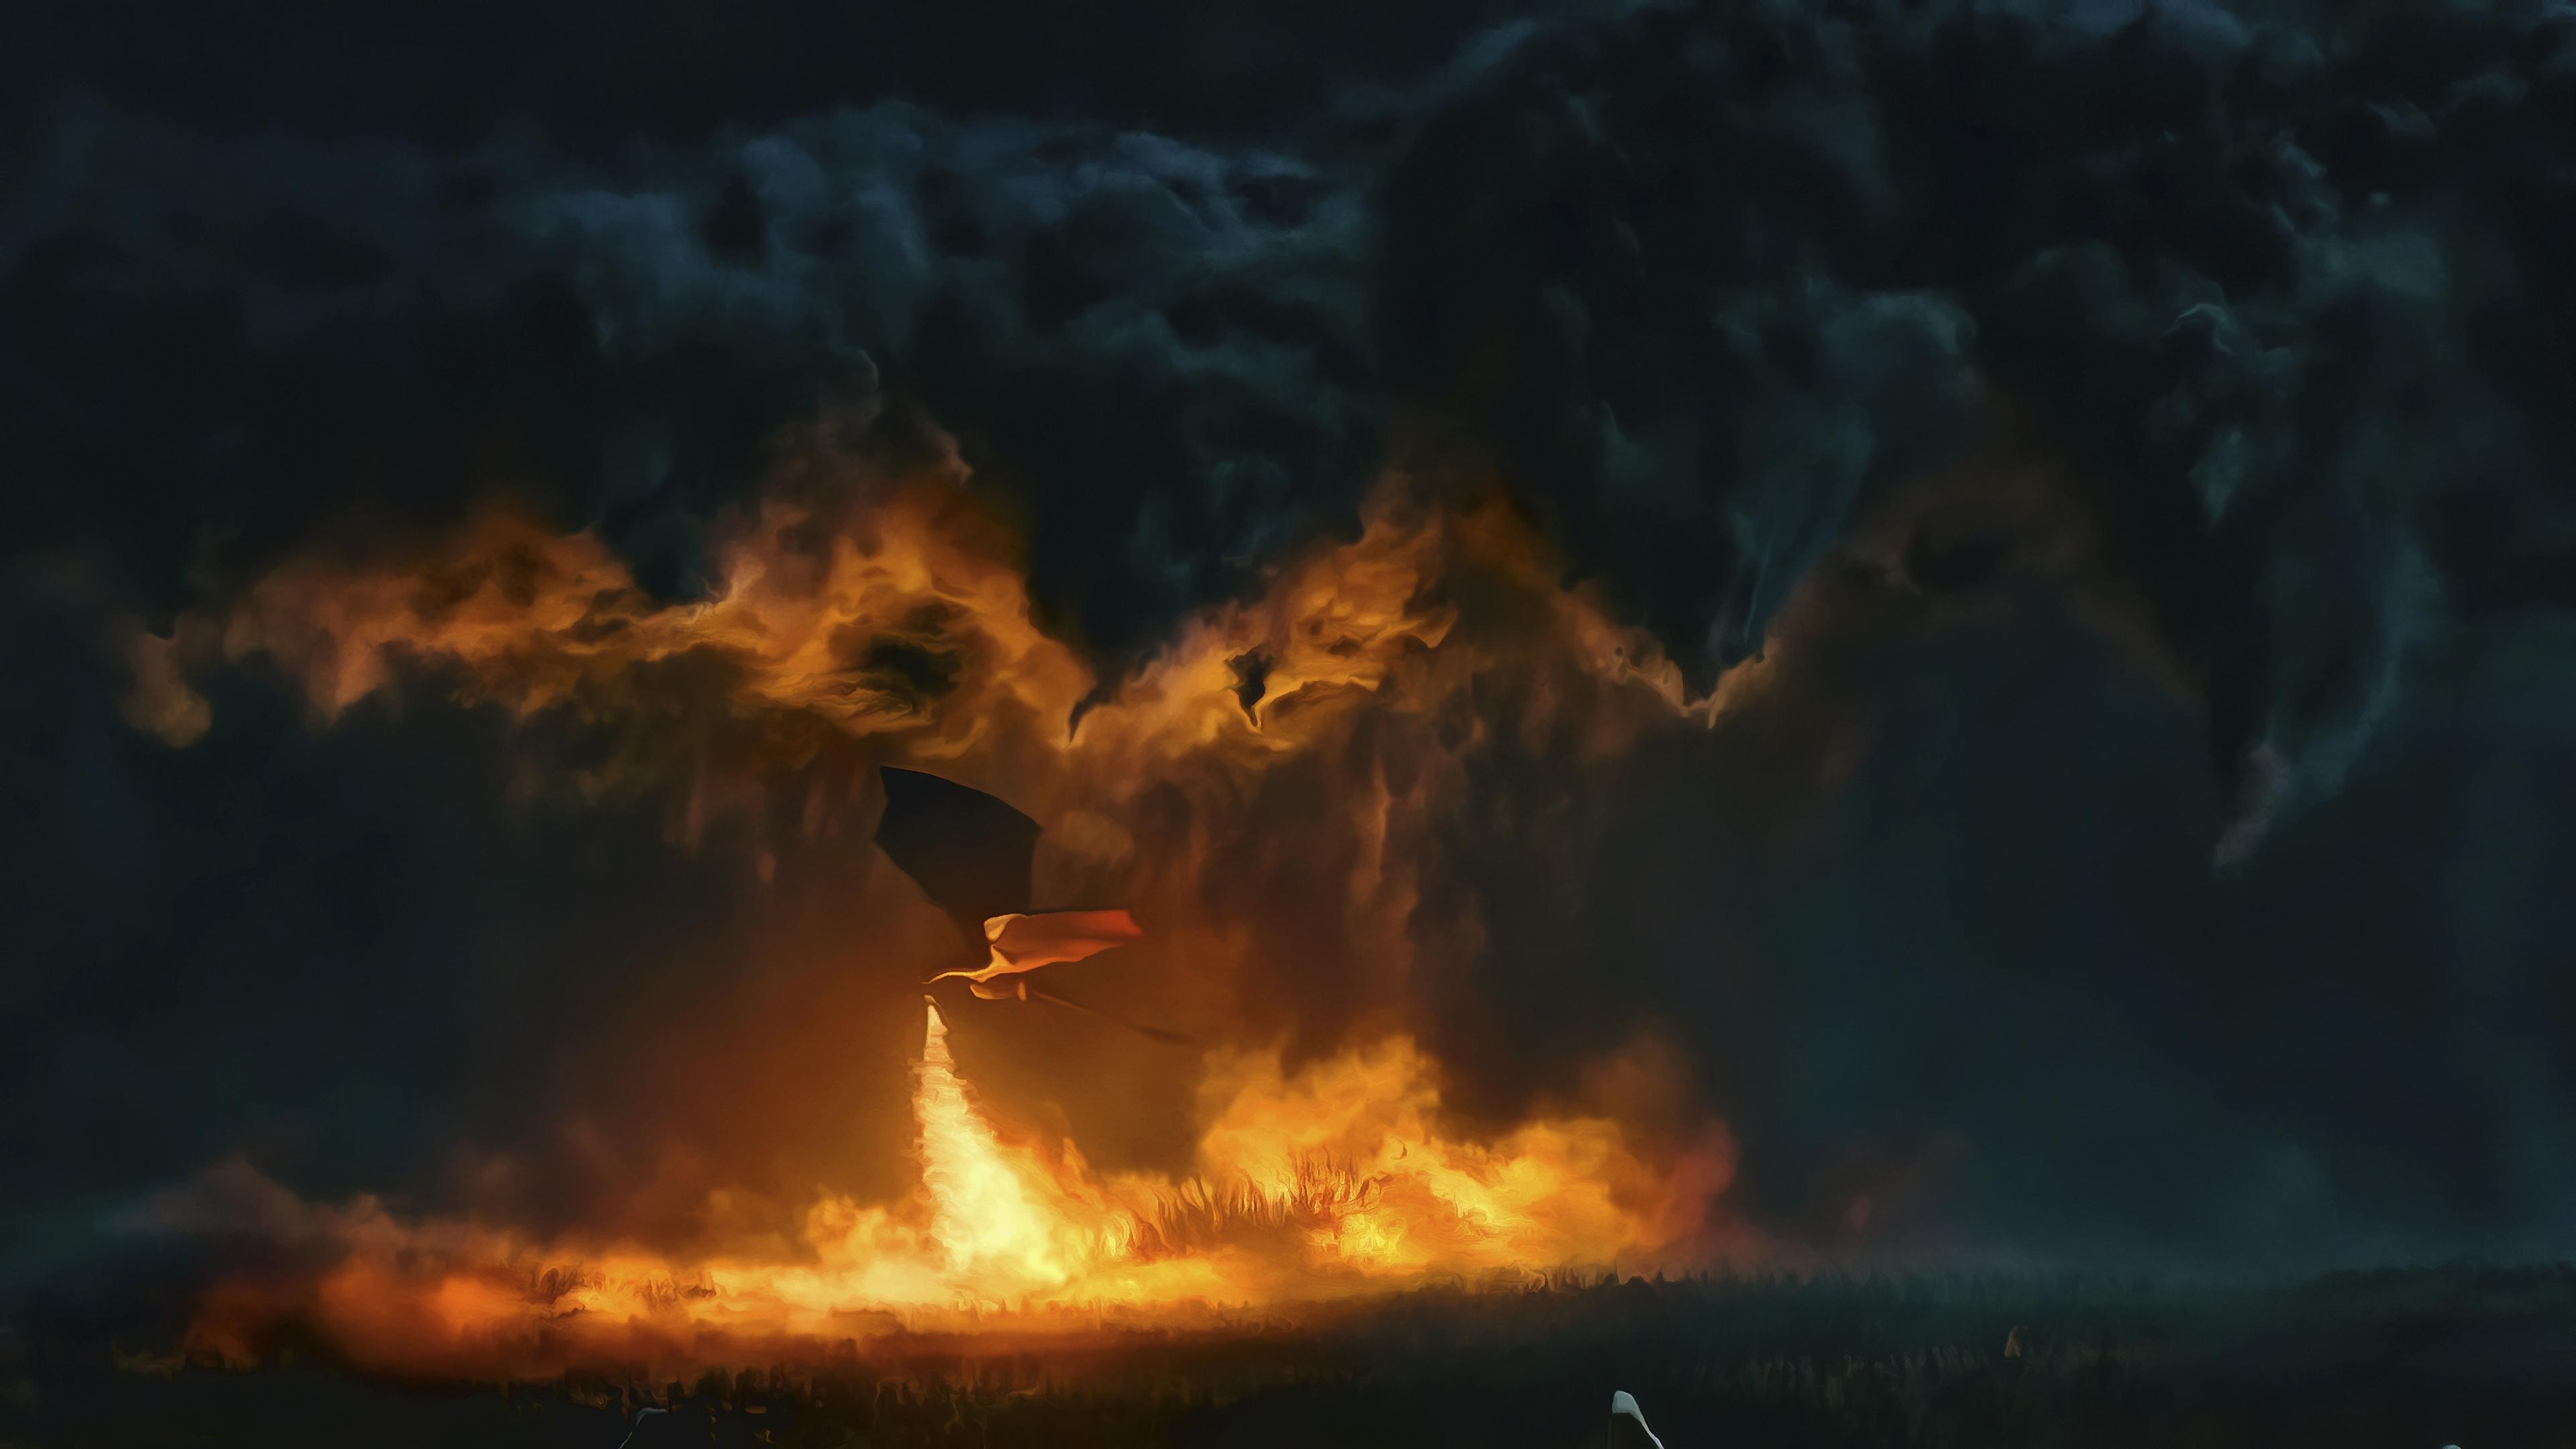 3840x2160 Game Of Thrones Dragon Fire 4k Wallpaper Hd